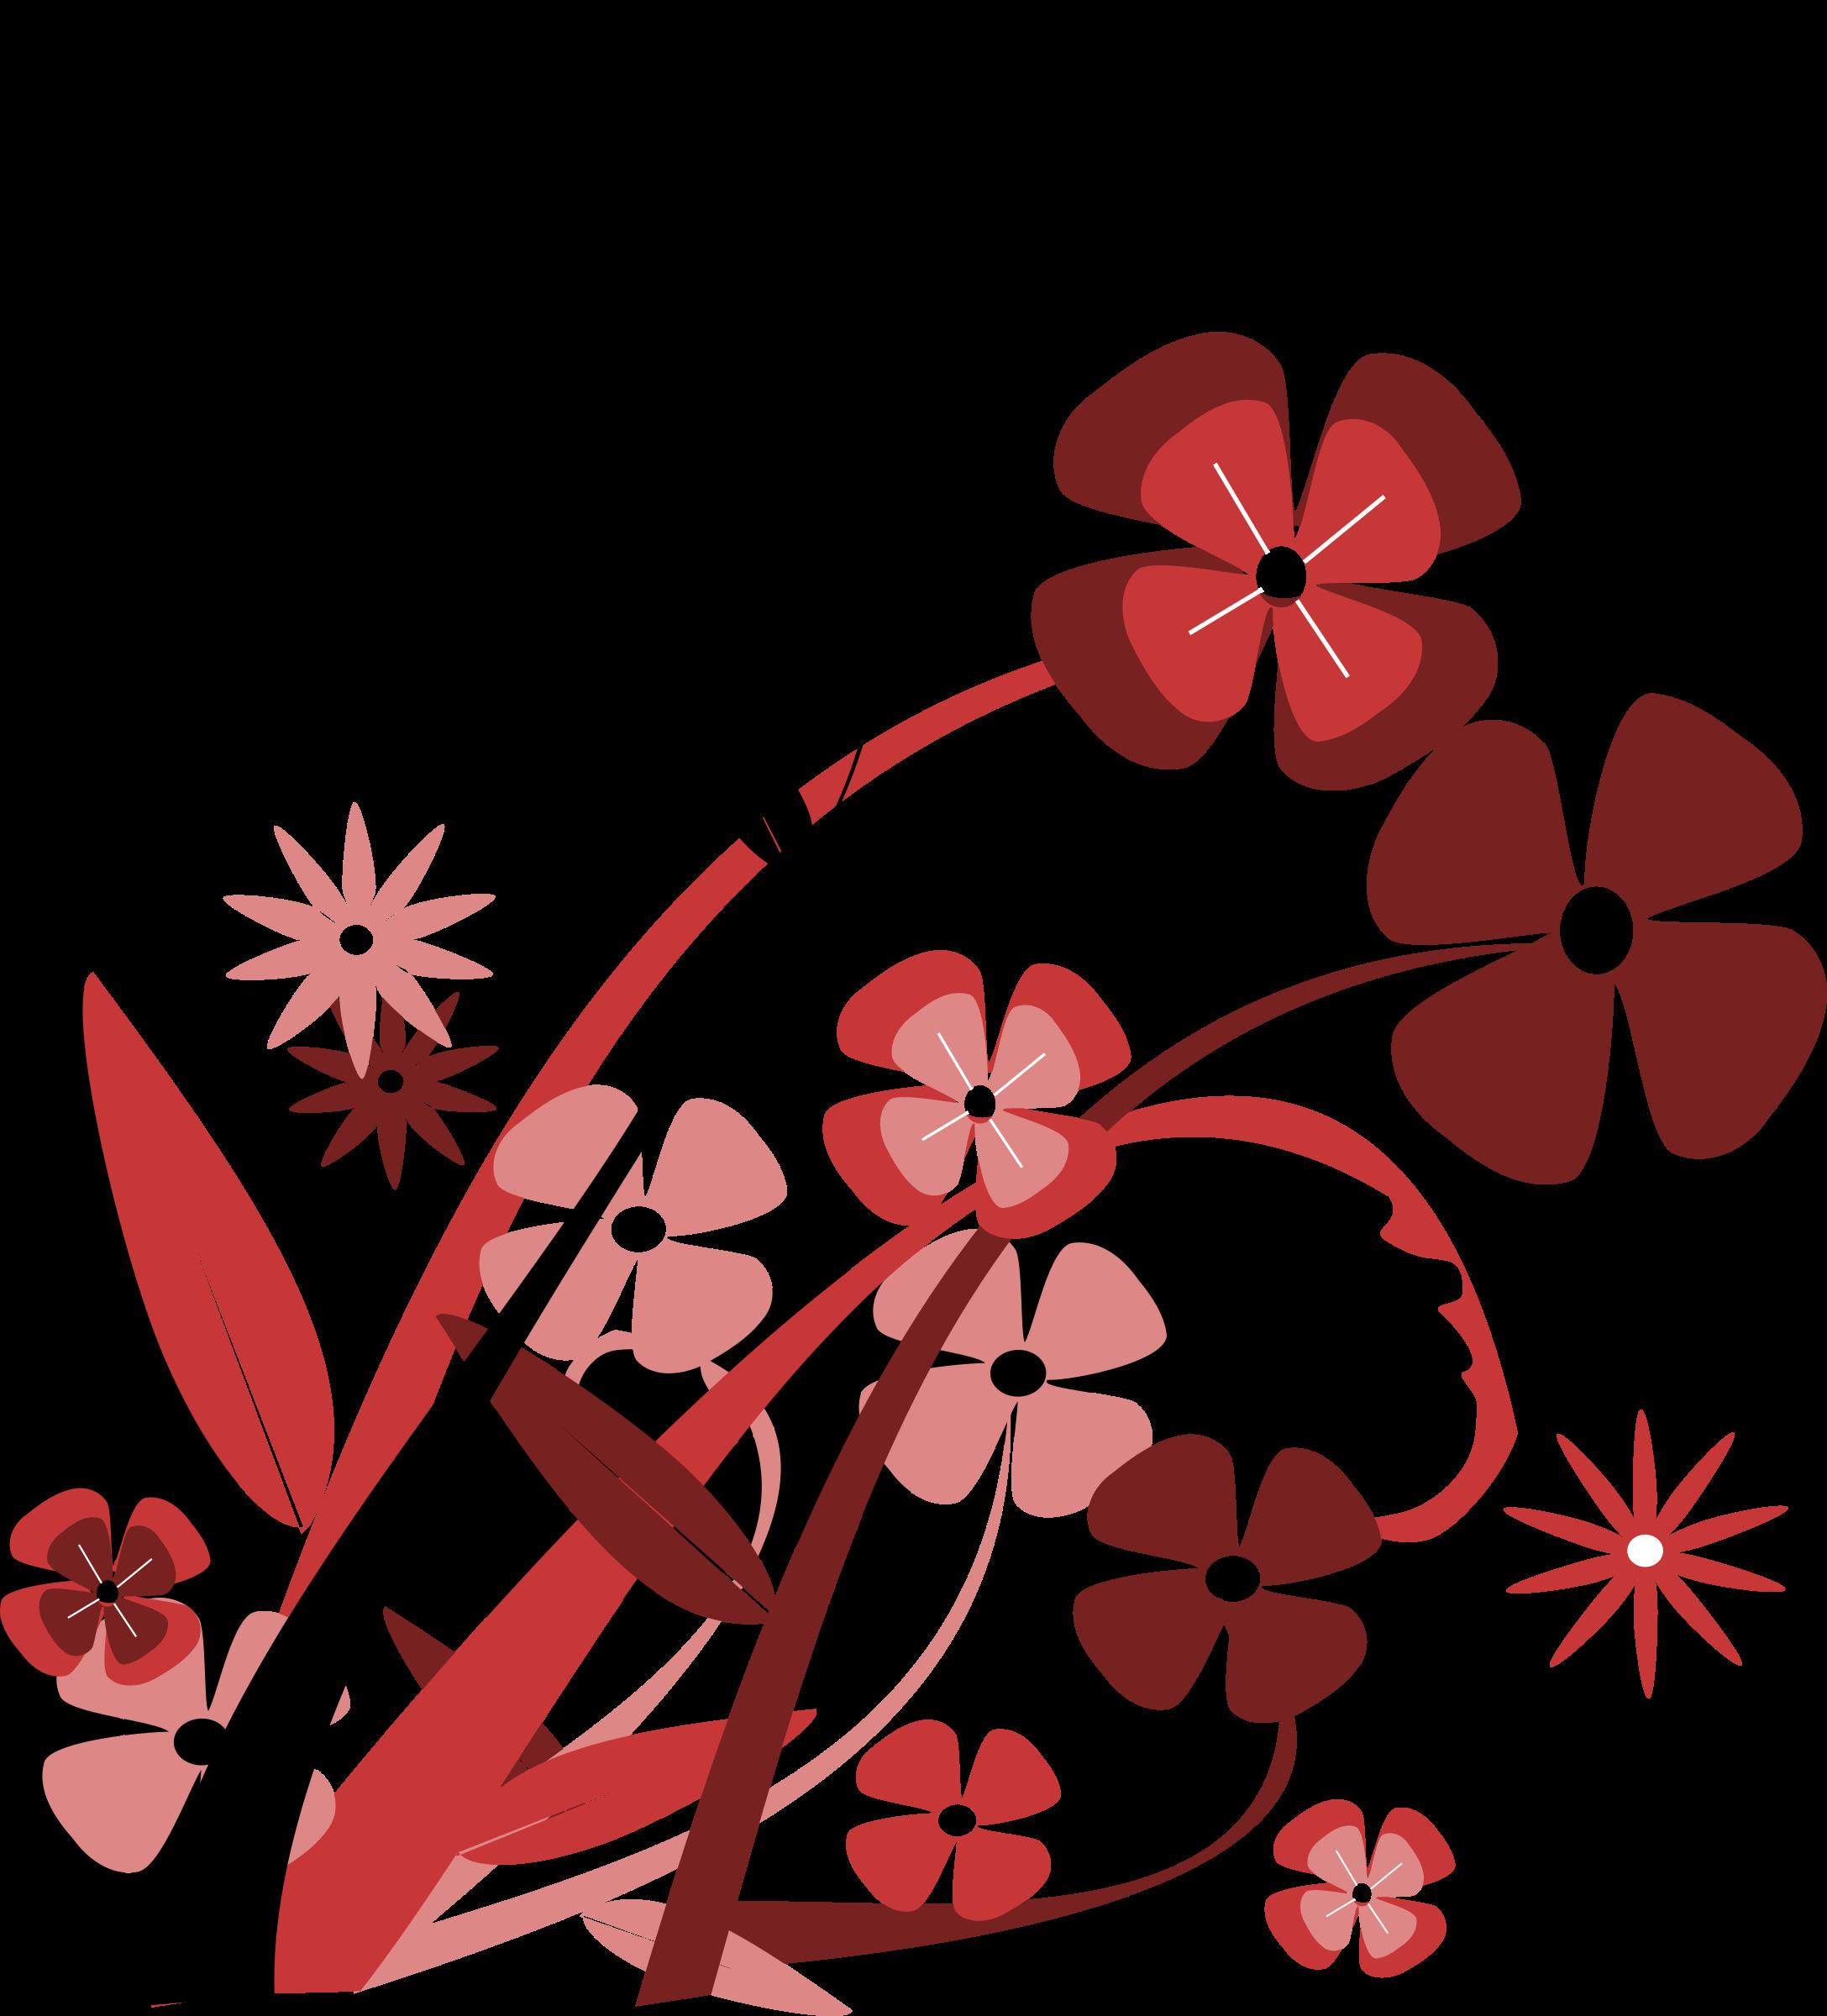 Clipart panda spring. Flower big image png